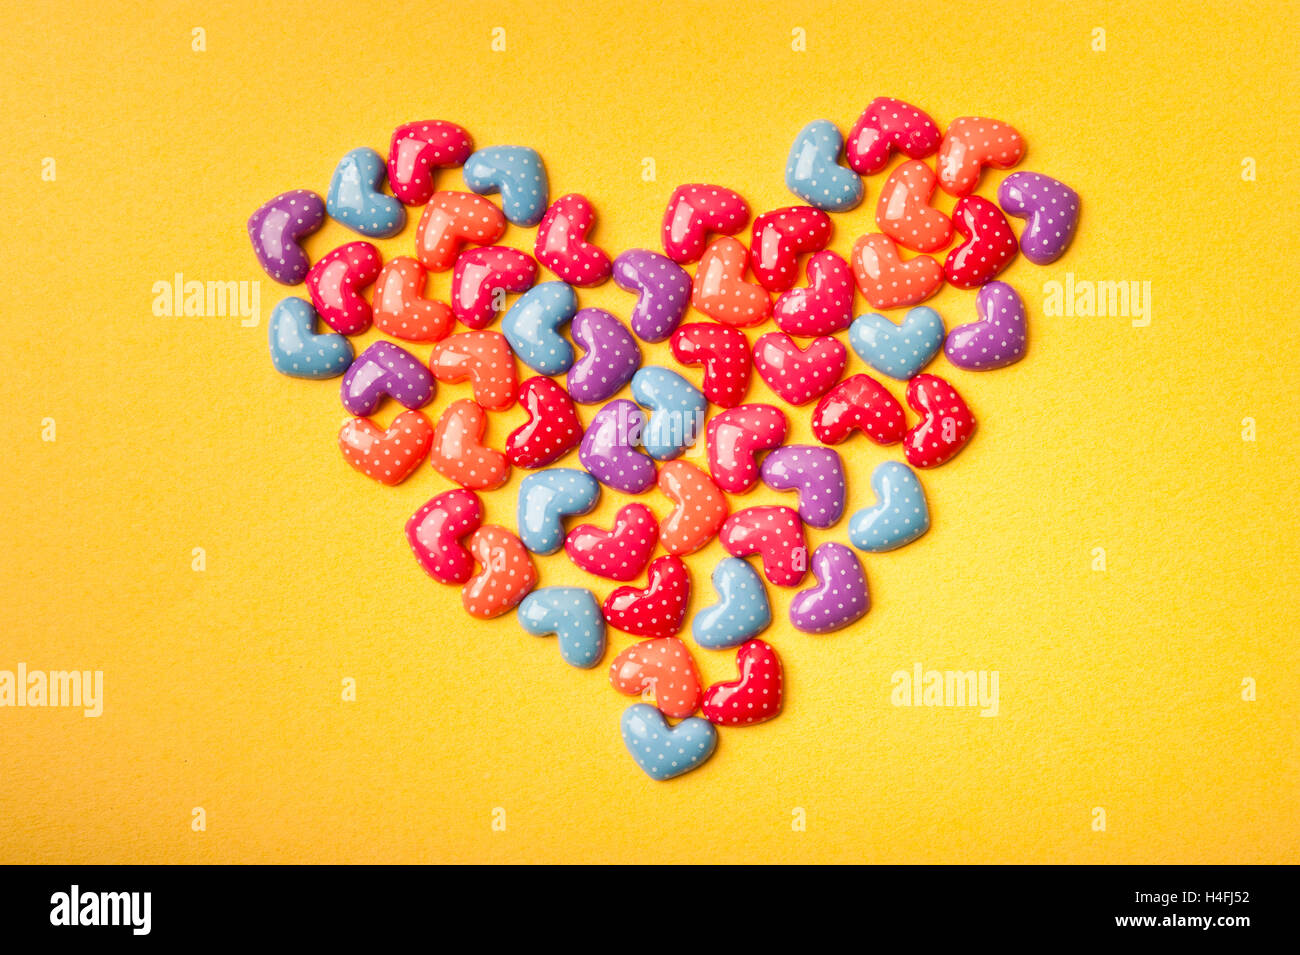 Herzform mit Konfetti, Liebe Konzept Stockbild